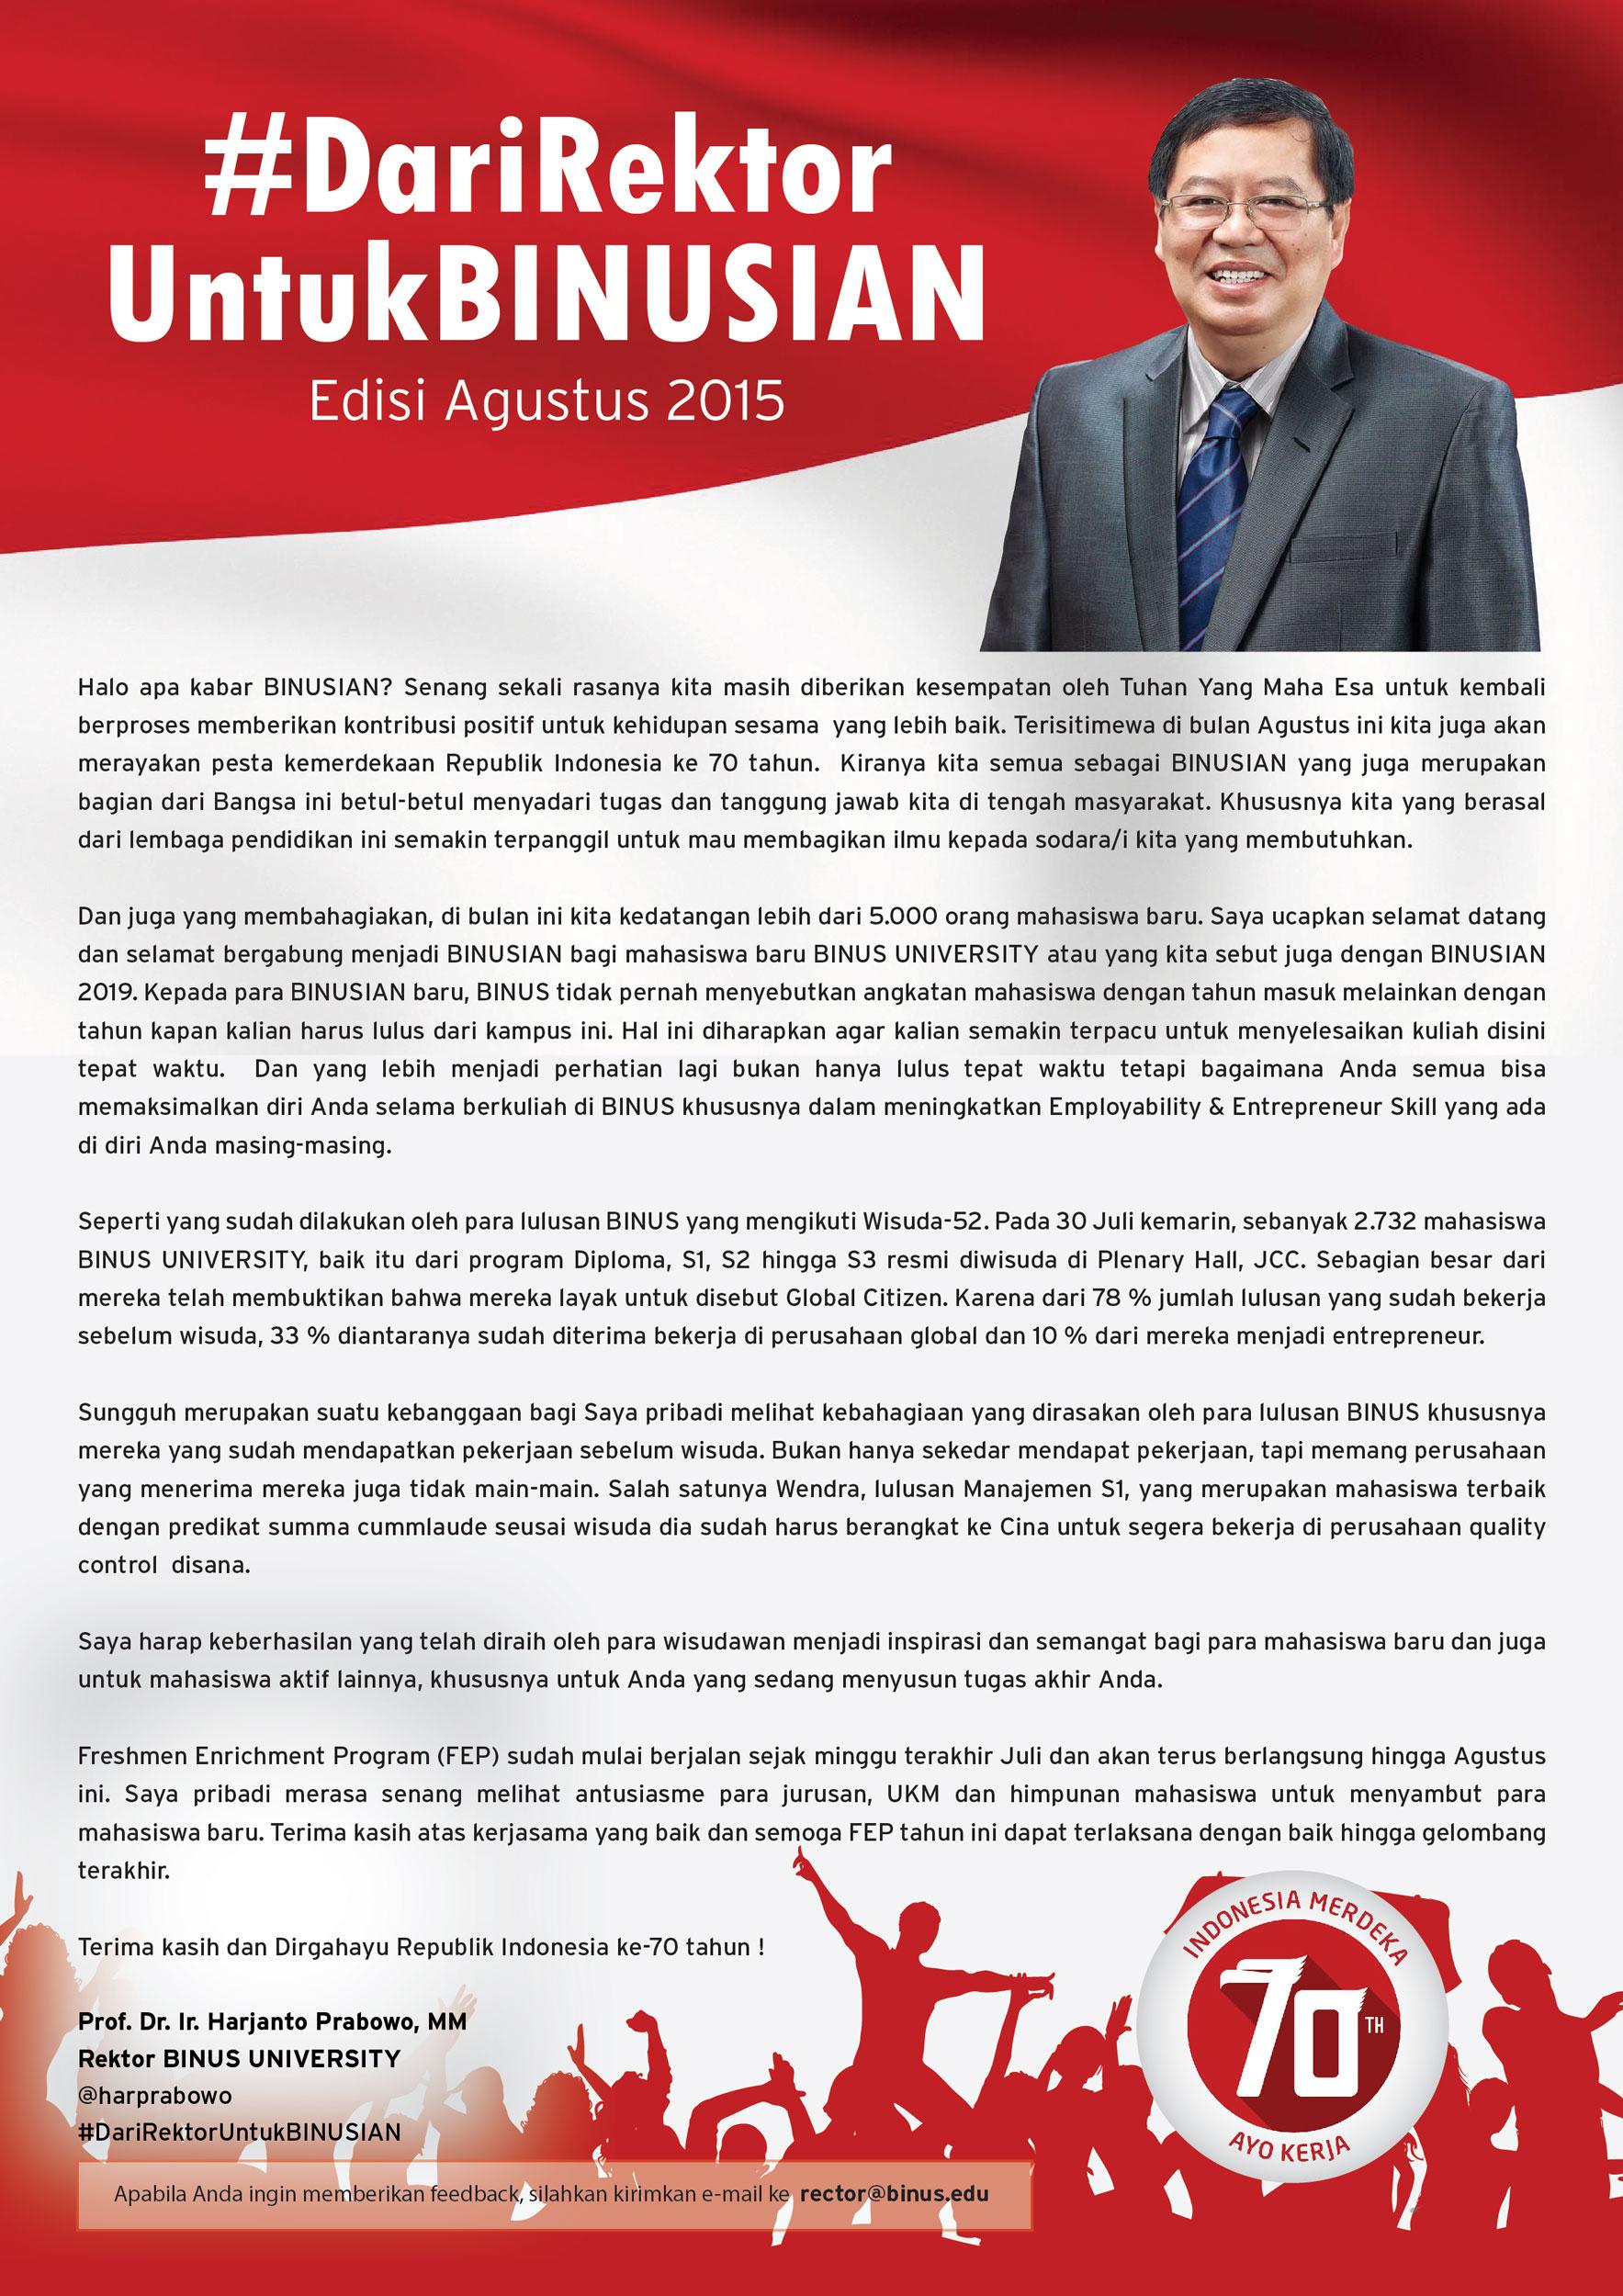 FA-greeting-rector-eds-Agustus-2015-01